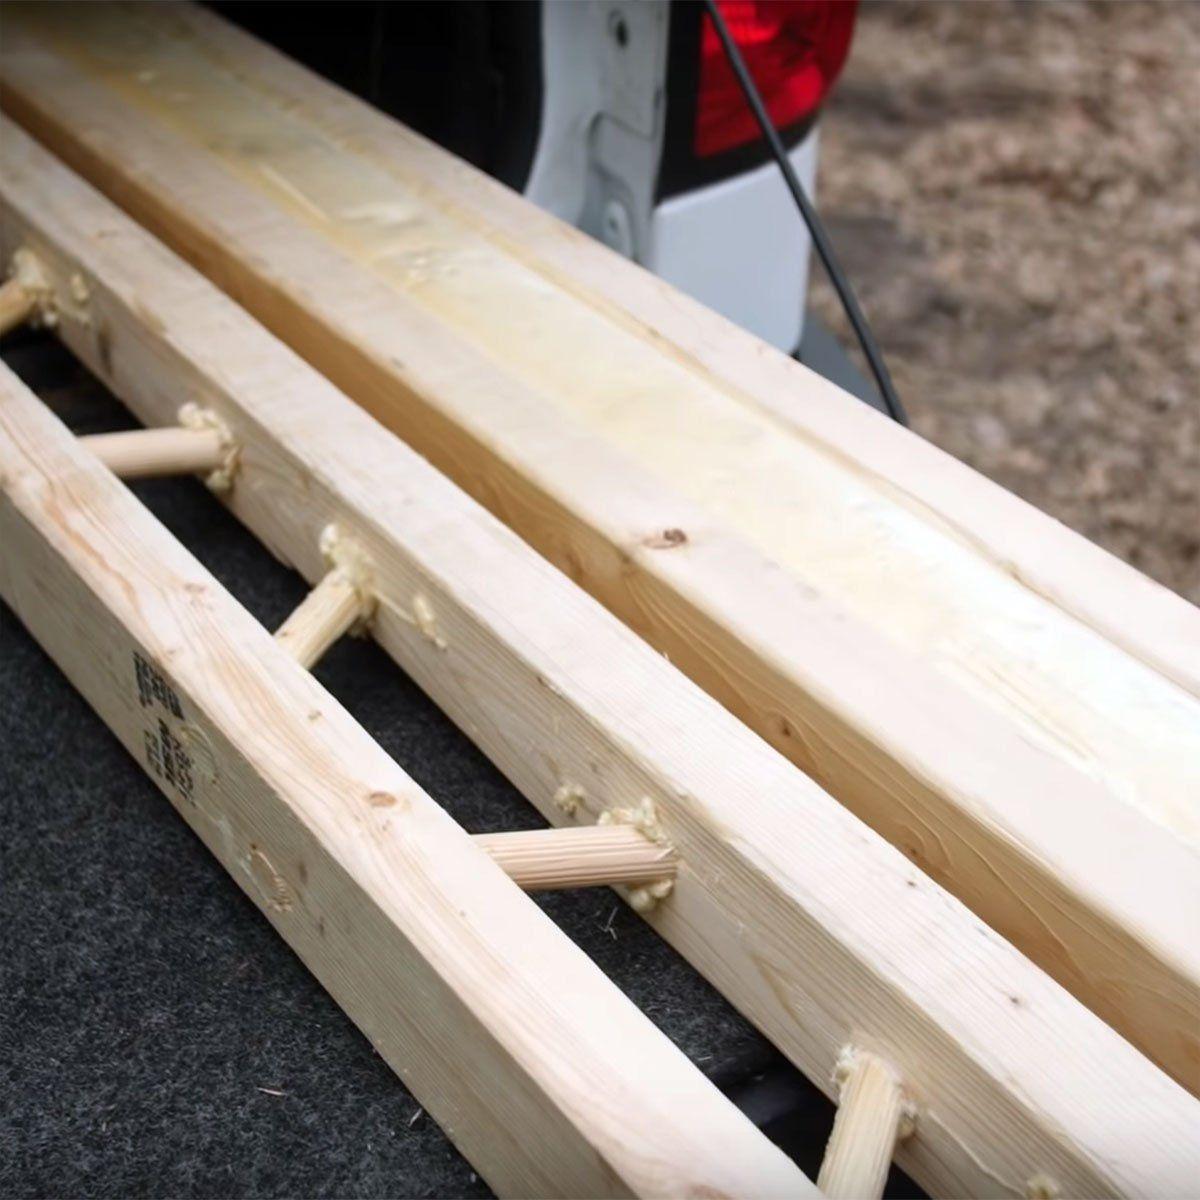 Tstuds Will This New Innovation Eliminate House Wrap External Insulation Fiberglass Insulation Innovation